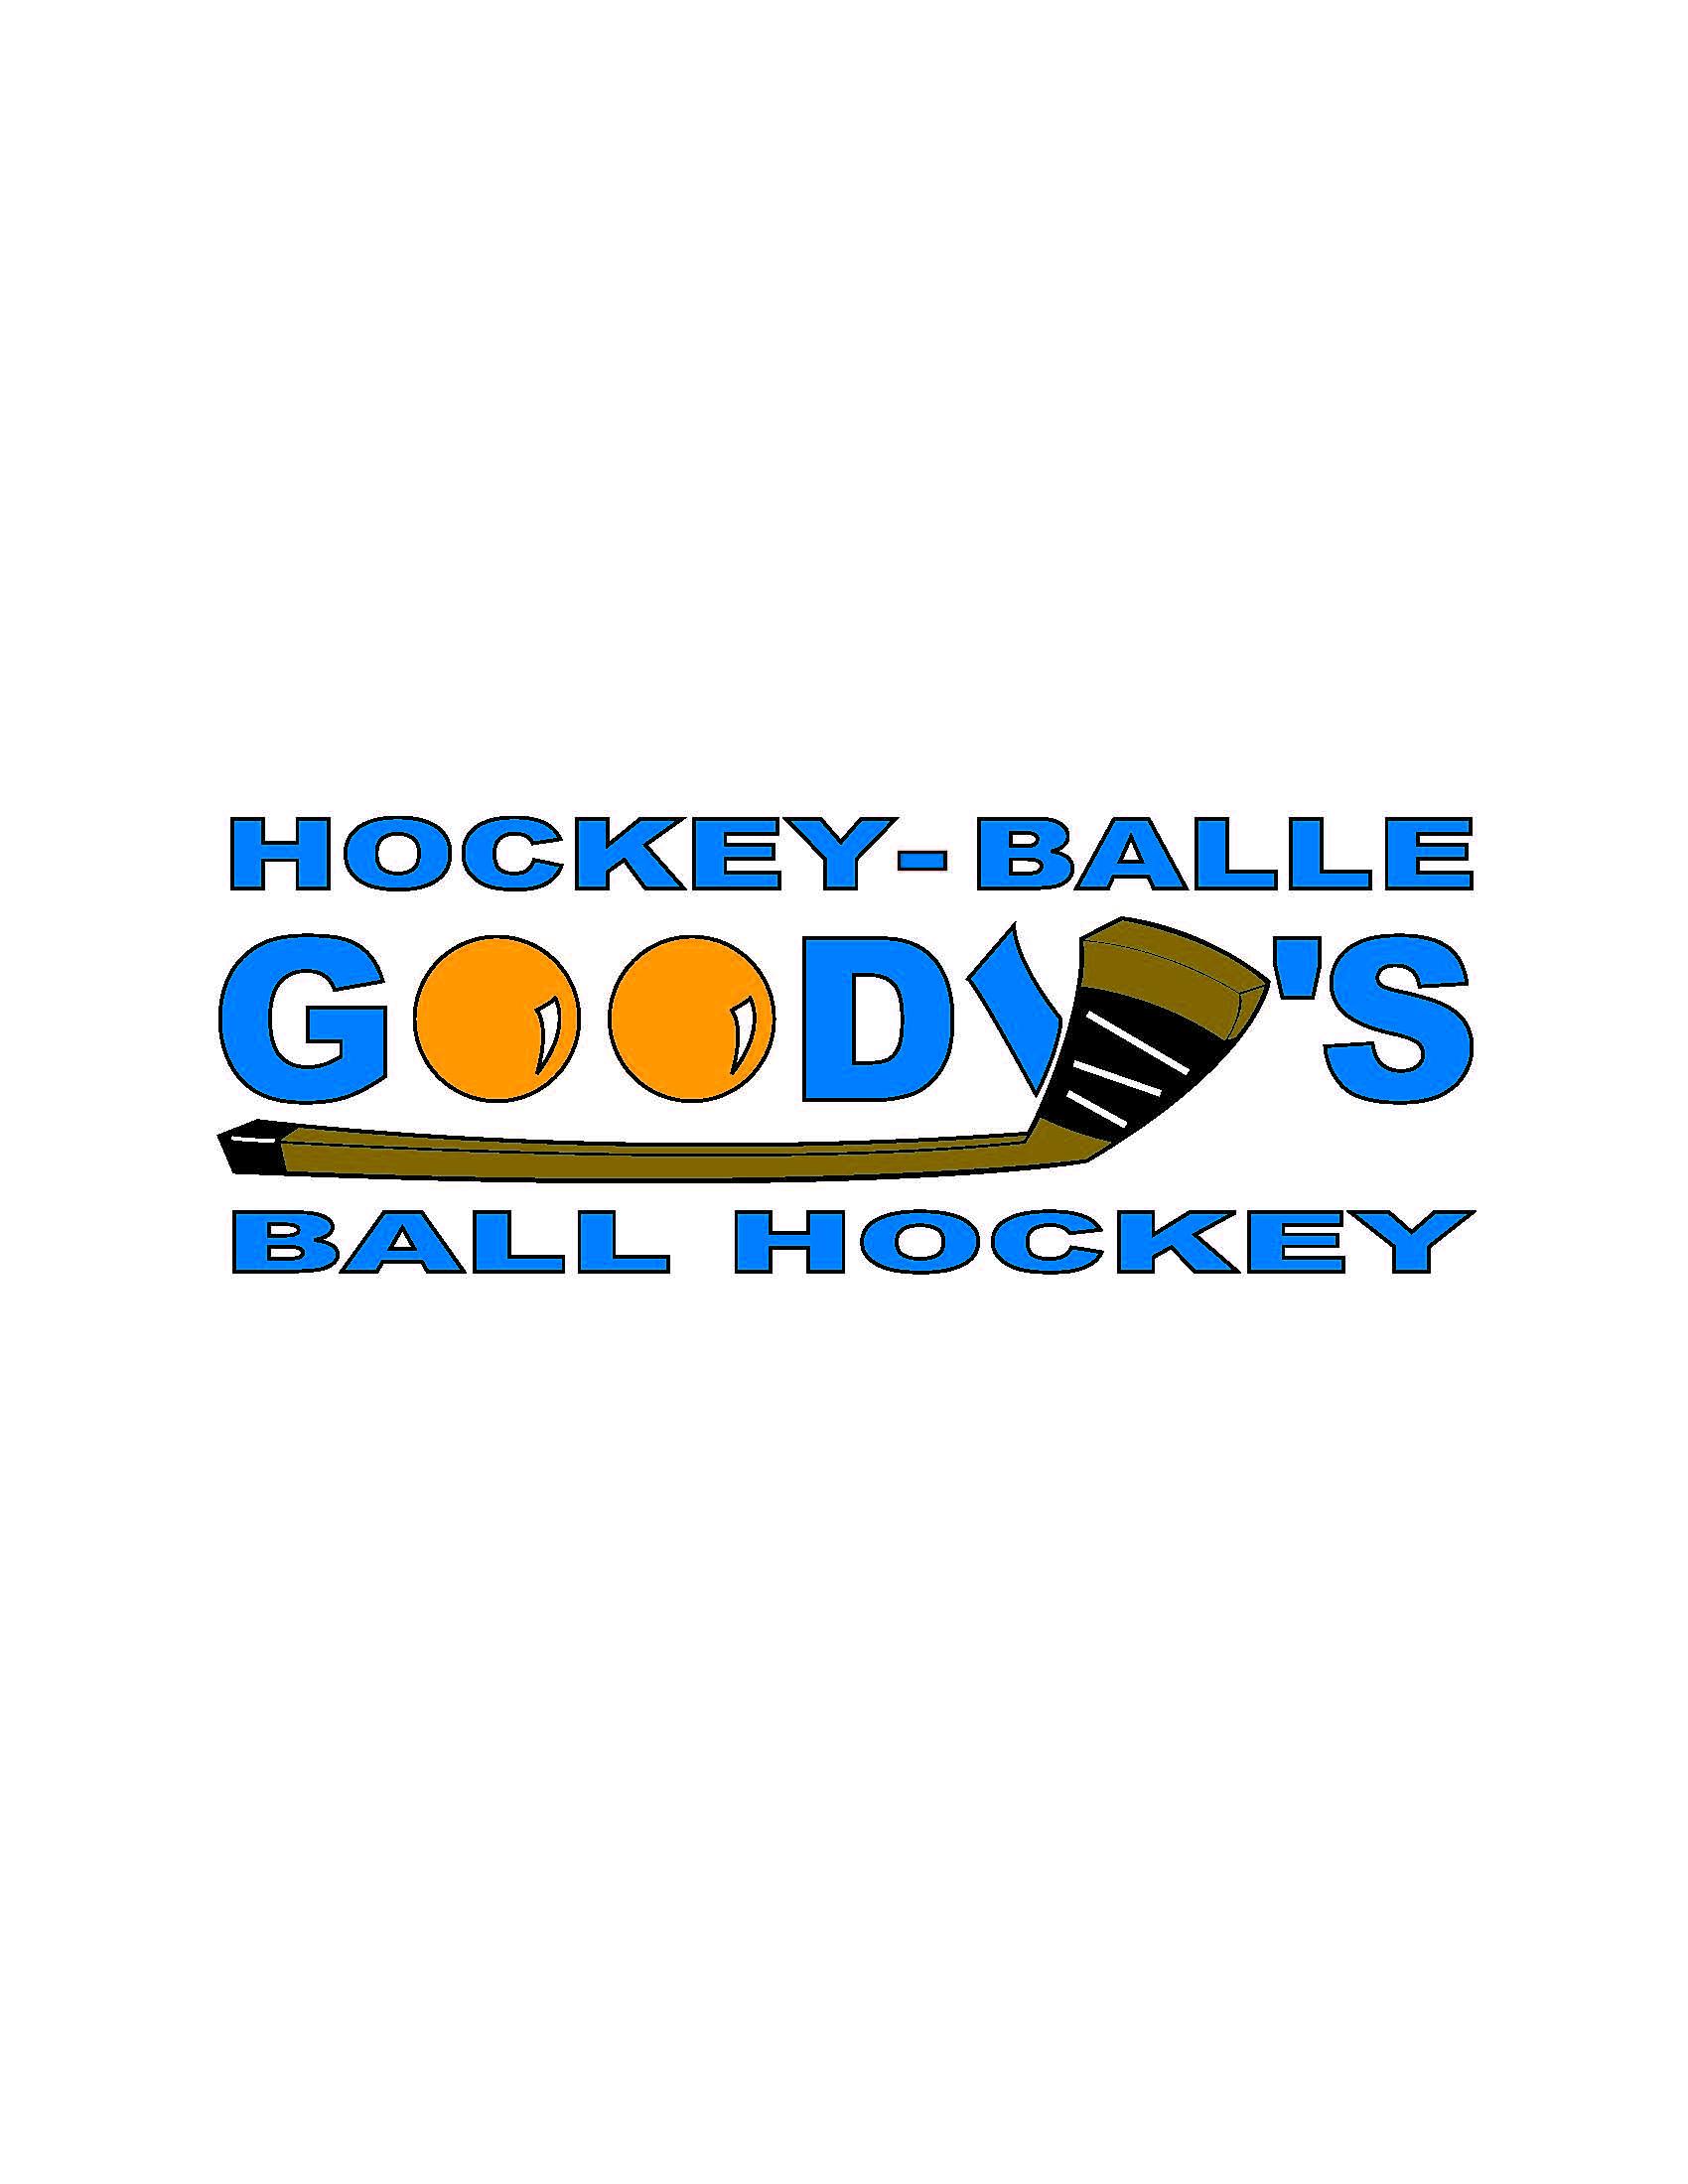 GoodiesBallHockey_bilingue.jpg (216 KB)